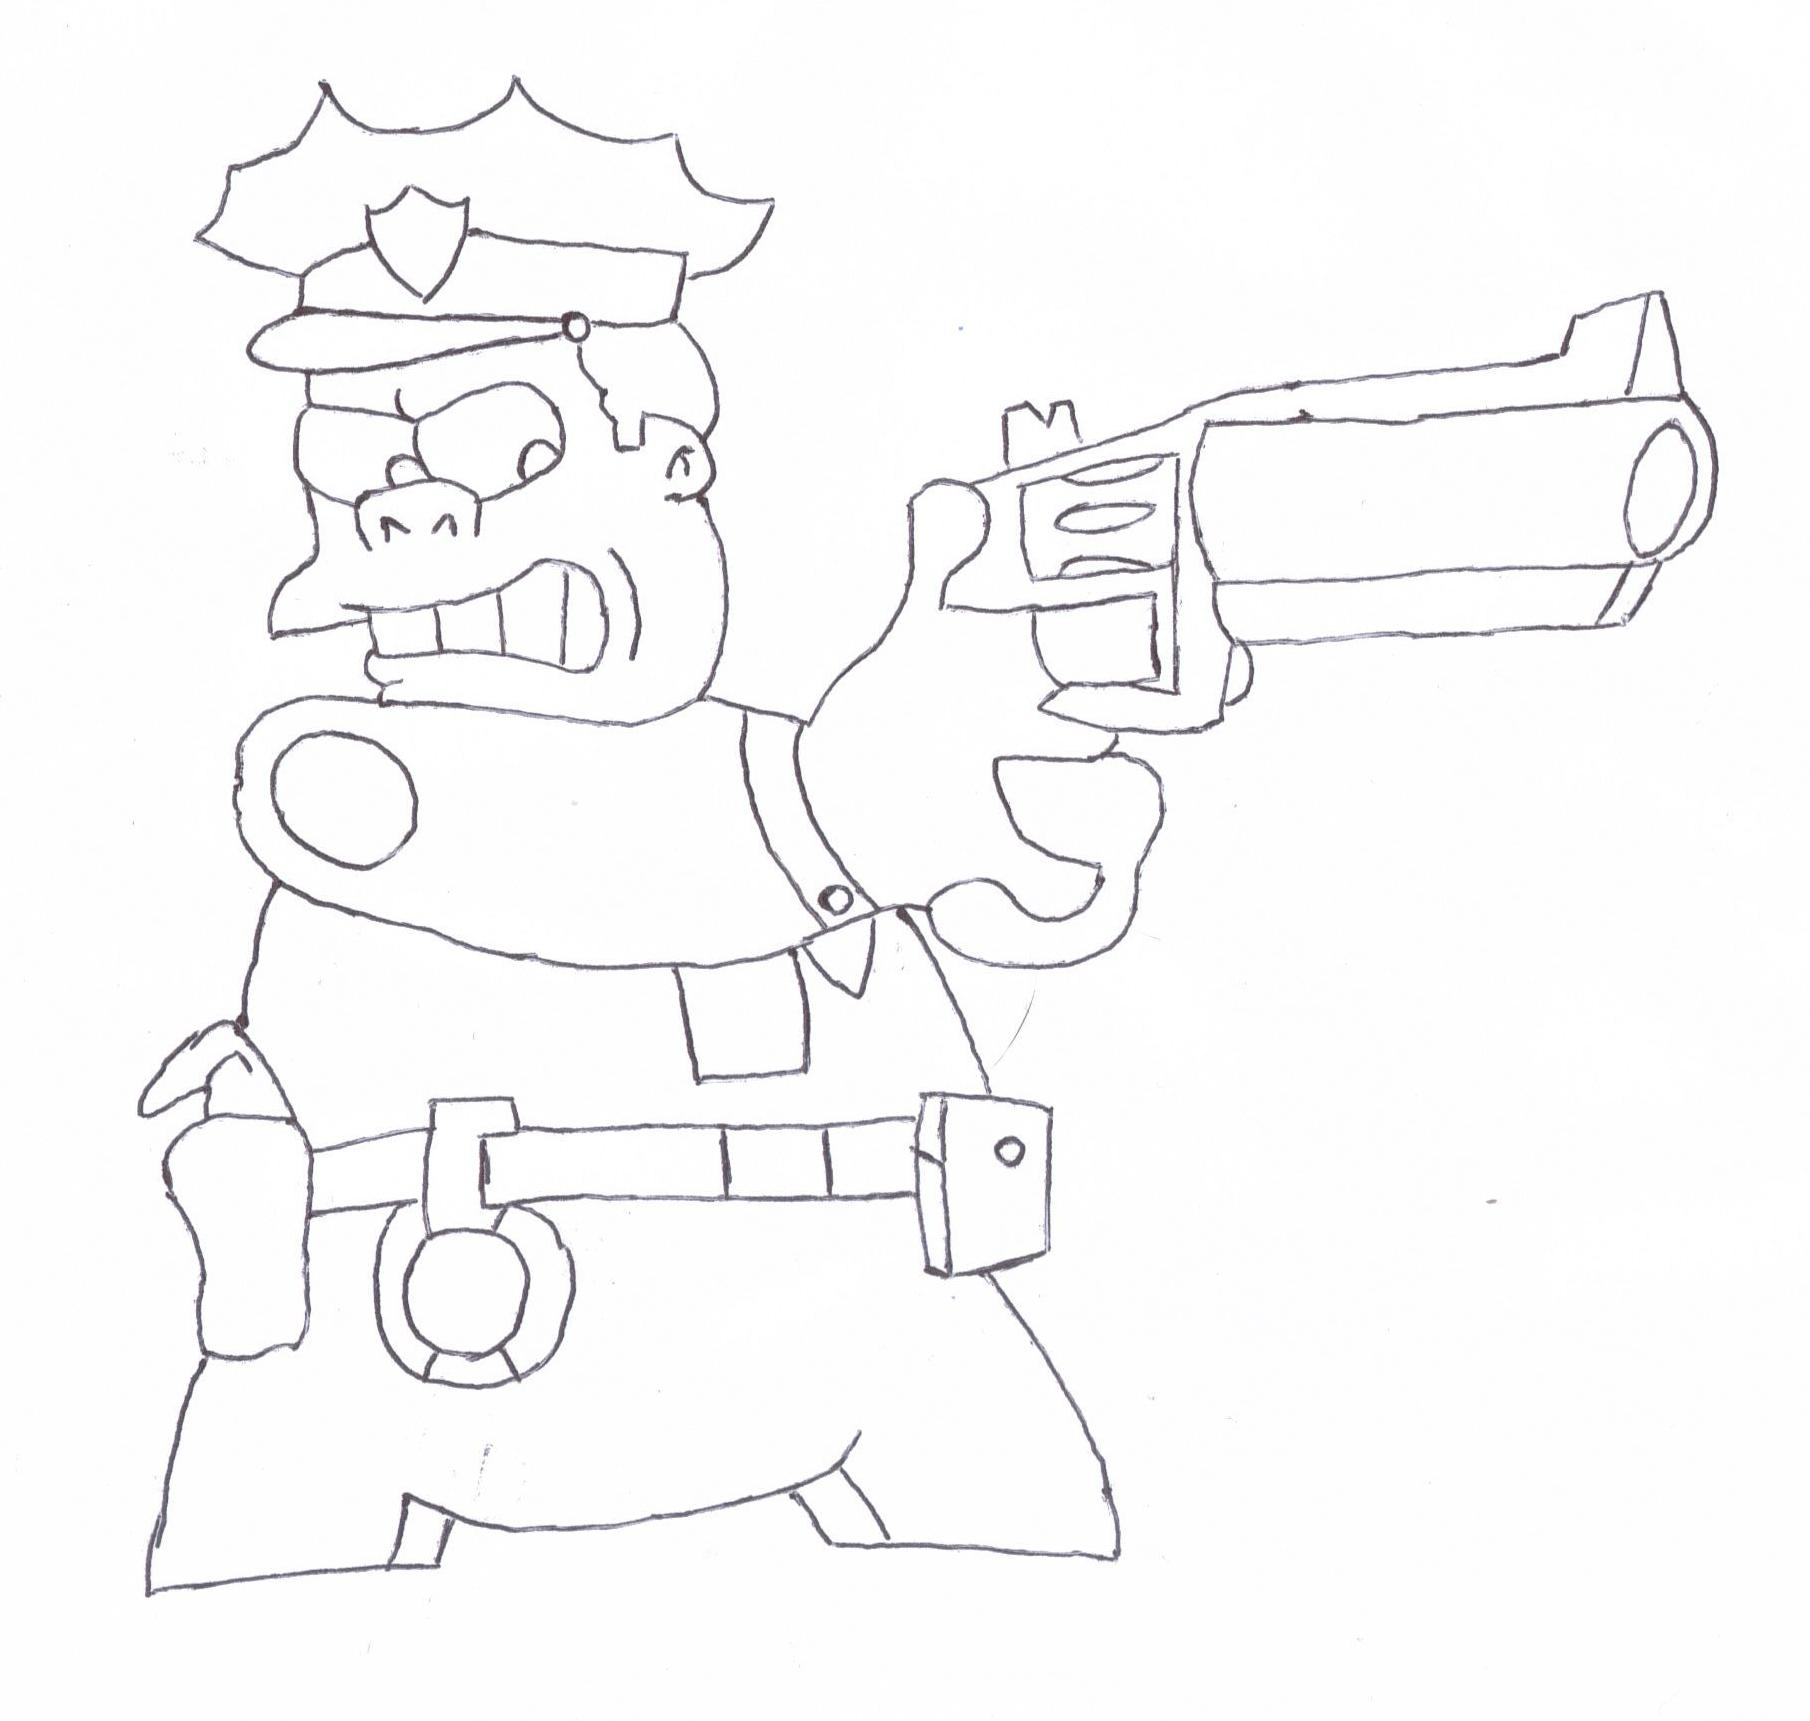 Chief Wiggum Sketch